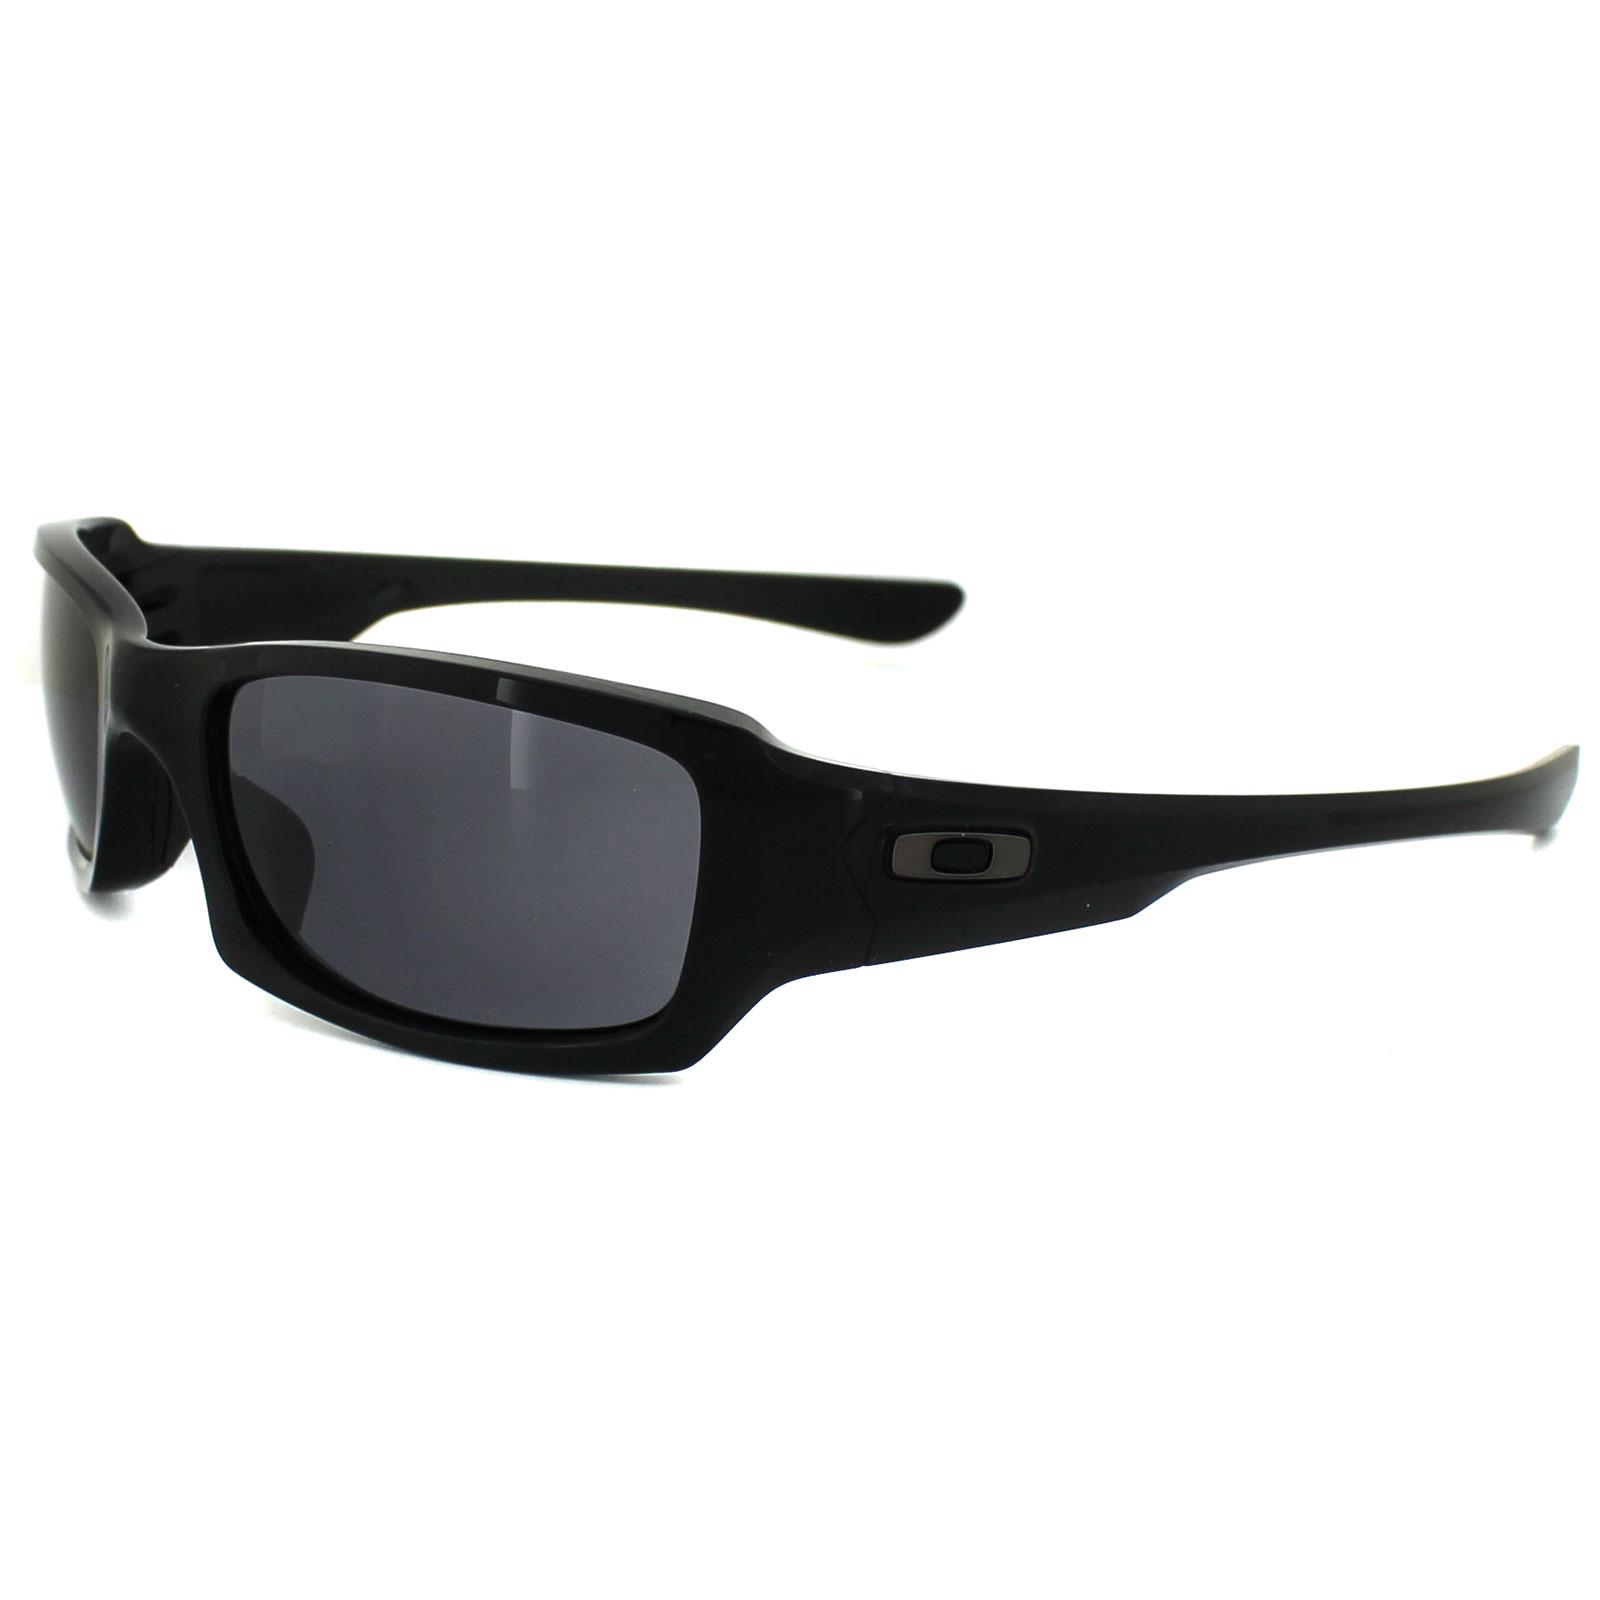 oakley sunglasses lowest price  Cheap Oakley Sunglasses - Discounted Sunglasses